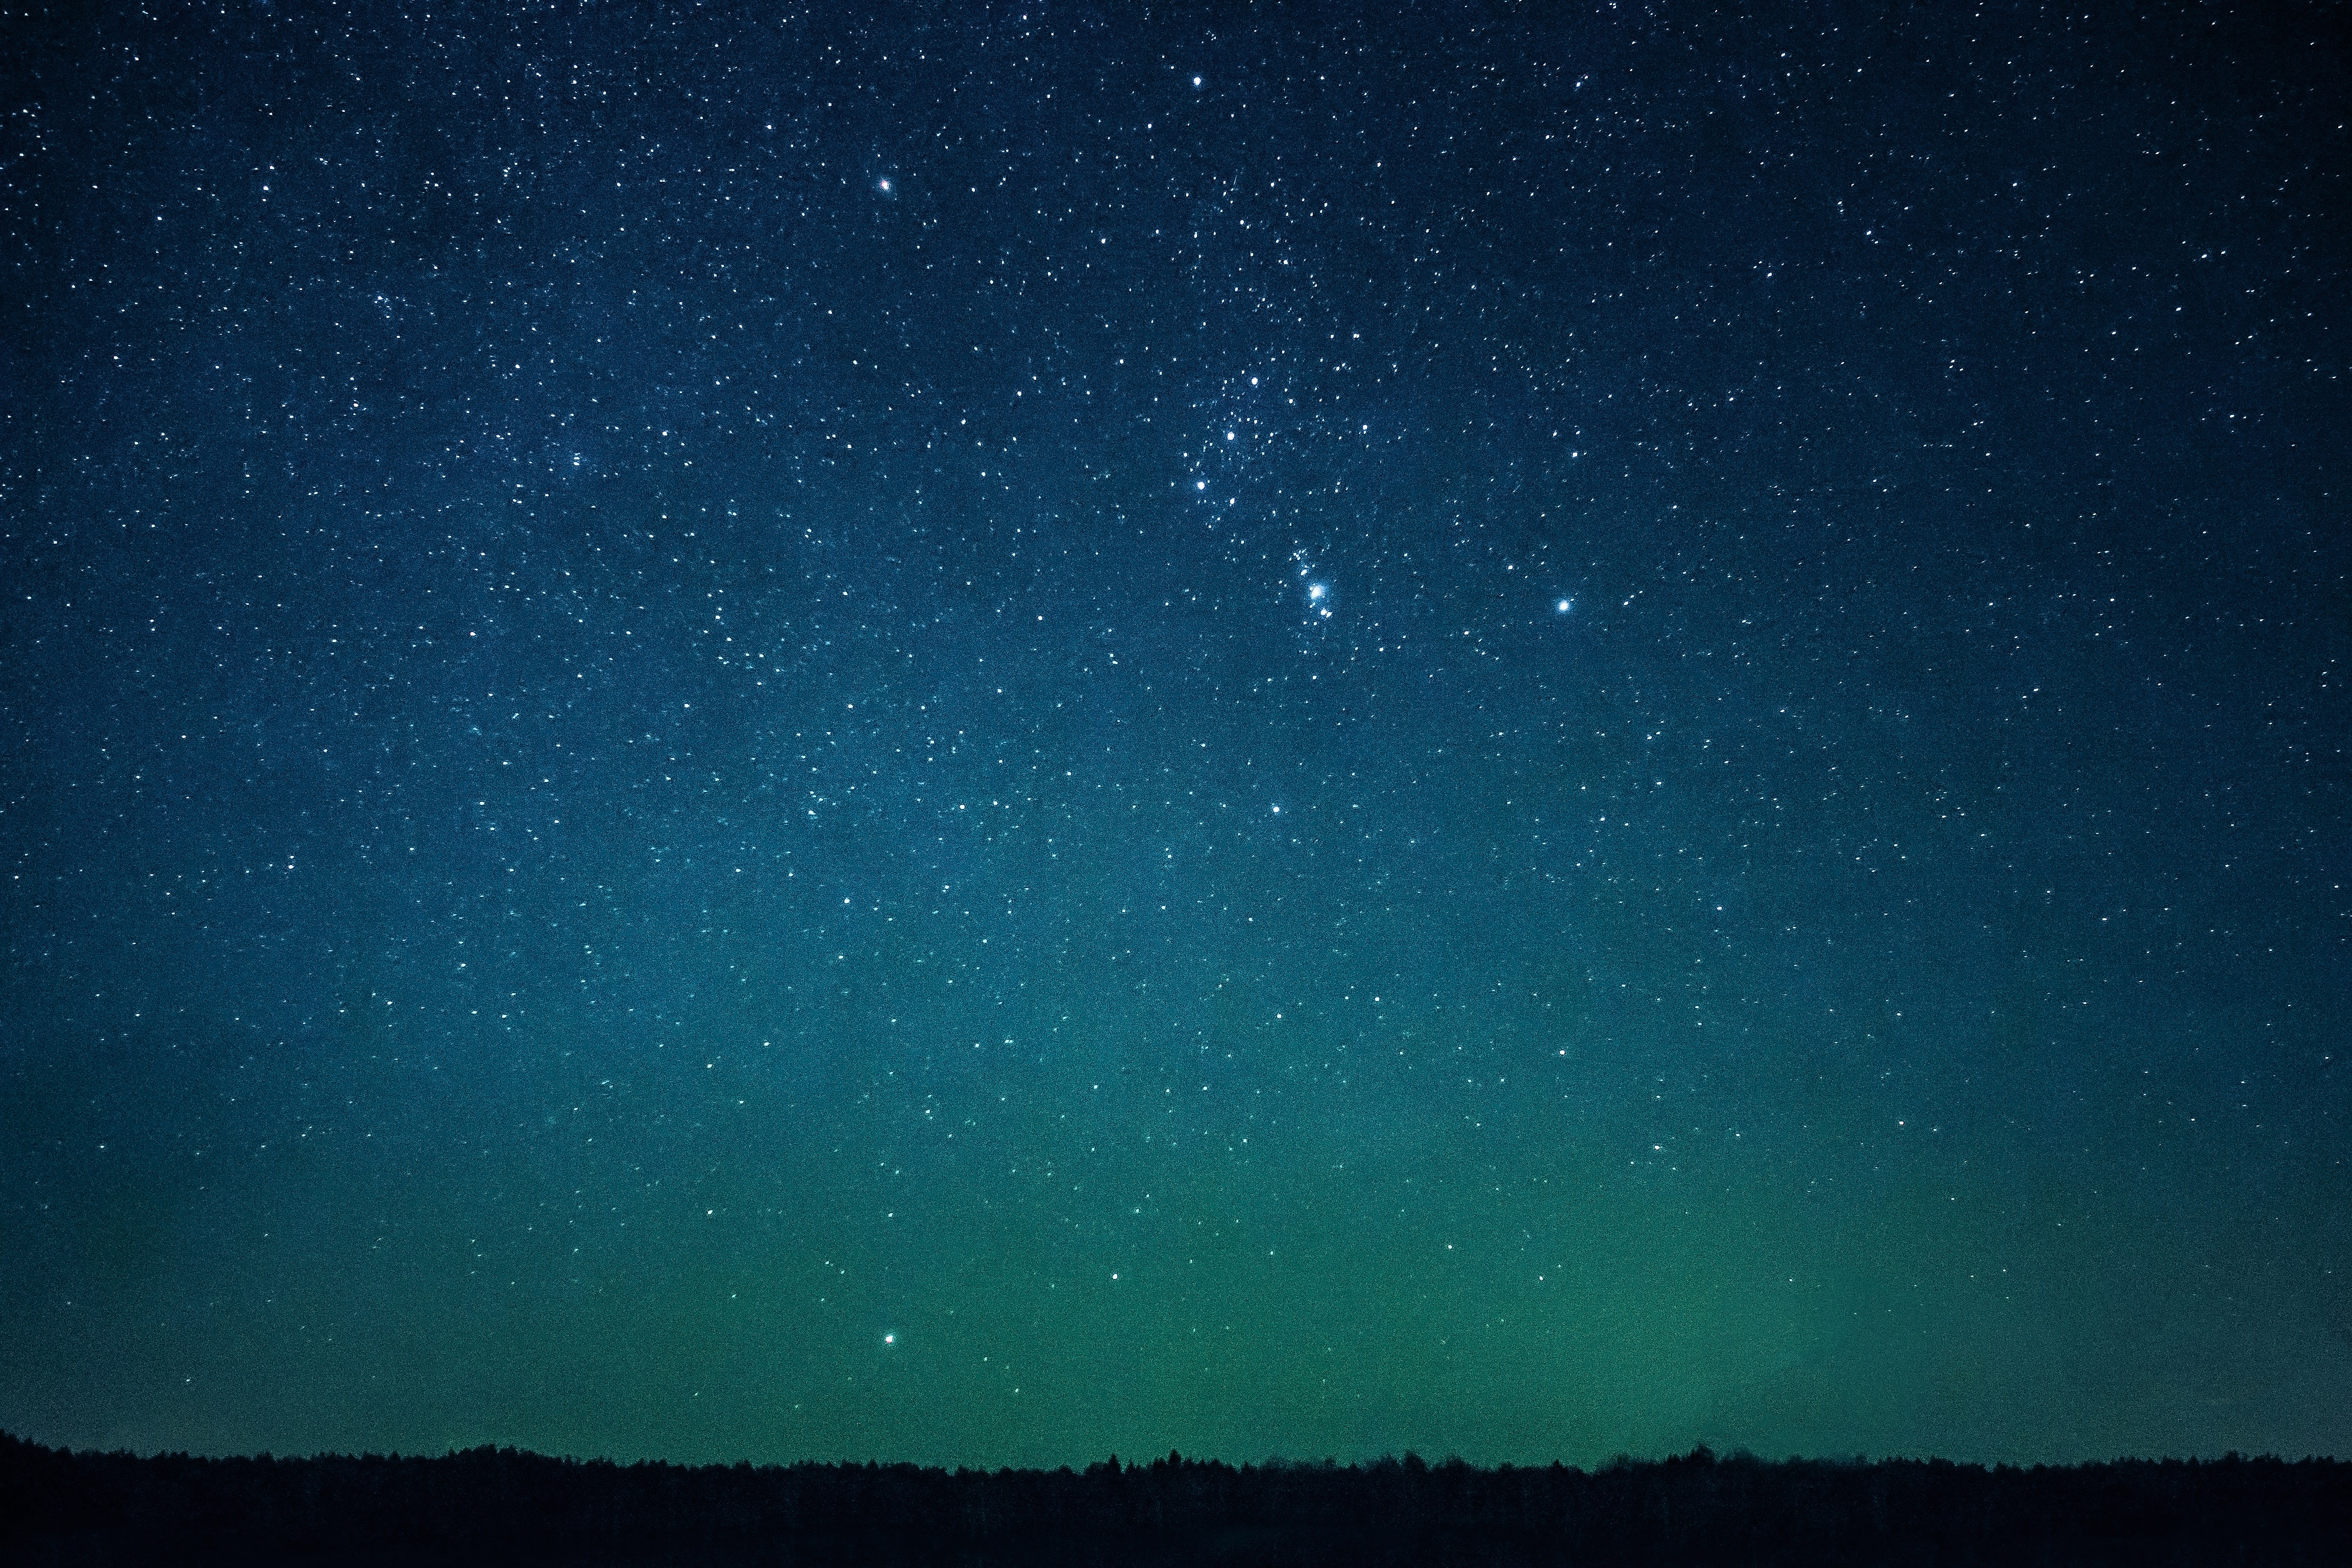 Stars in Night Sky, Beautiful, Peaceful, Twinkle, Stars, HQ Photo